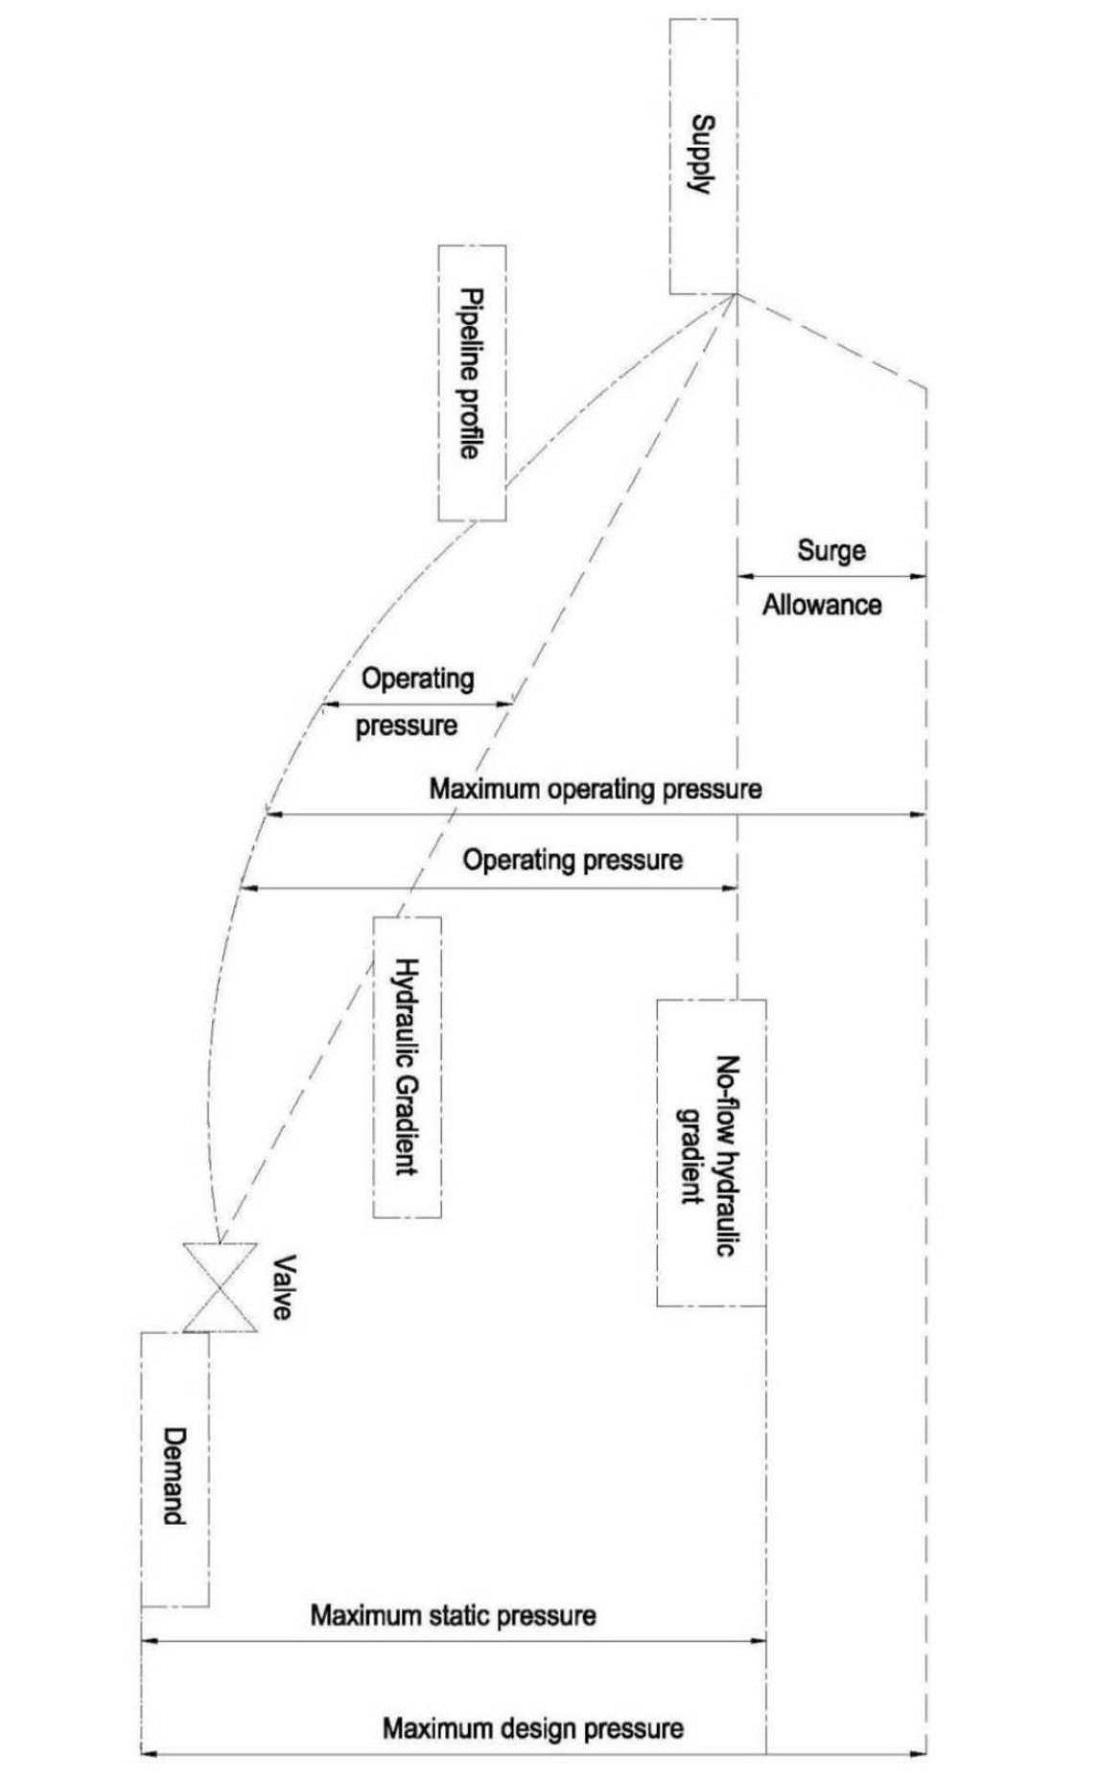 ds-7 appendix b.1 general